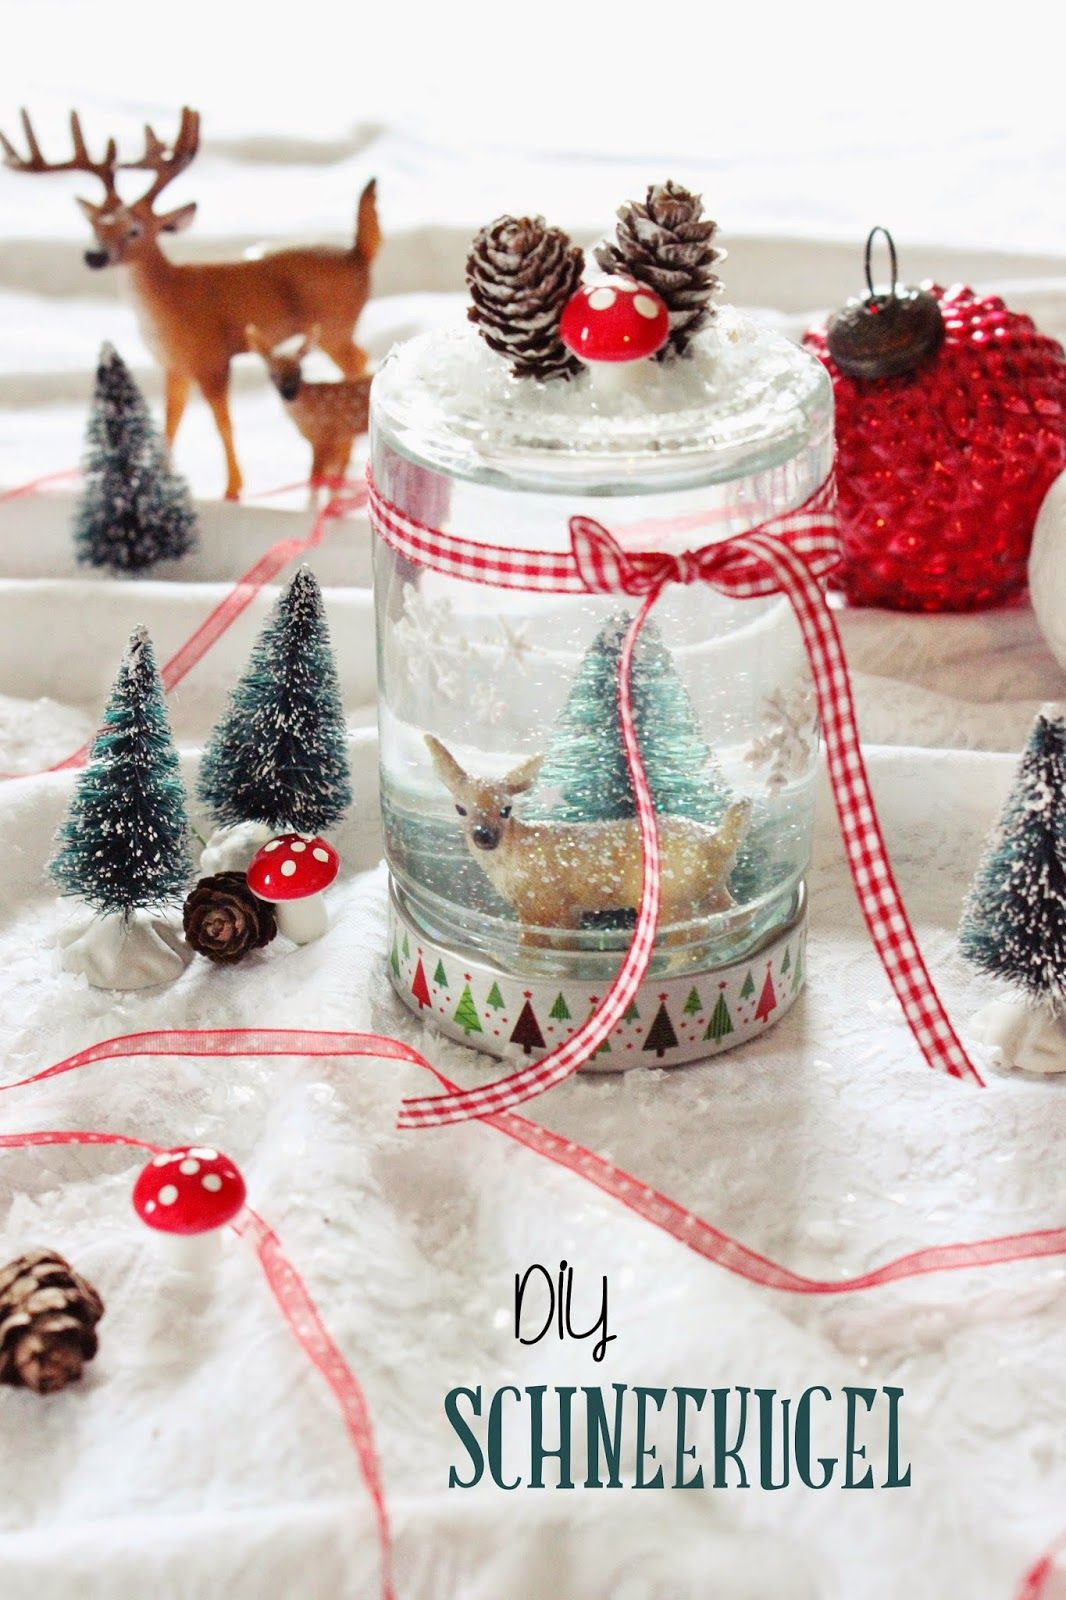 s 39 bastelkistle diy schneekugel christmas schneekugel diy schneekugel und schneekugel. Black Bedroom Furniture Sets. Home Design Ideas